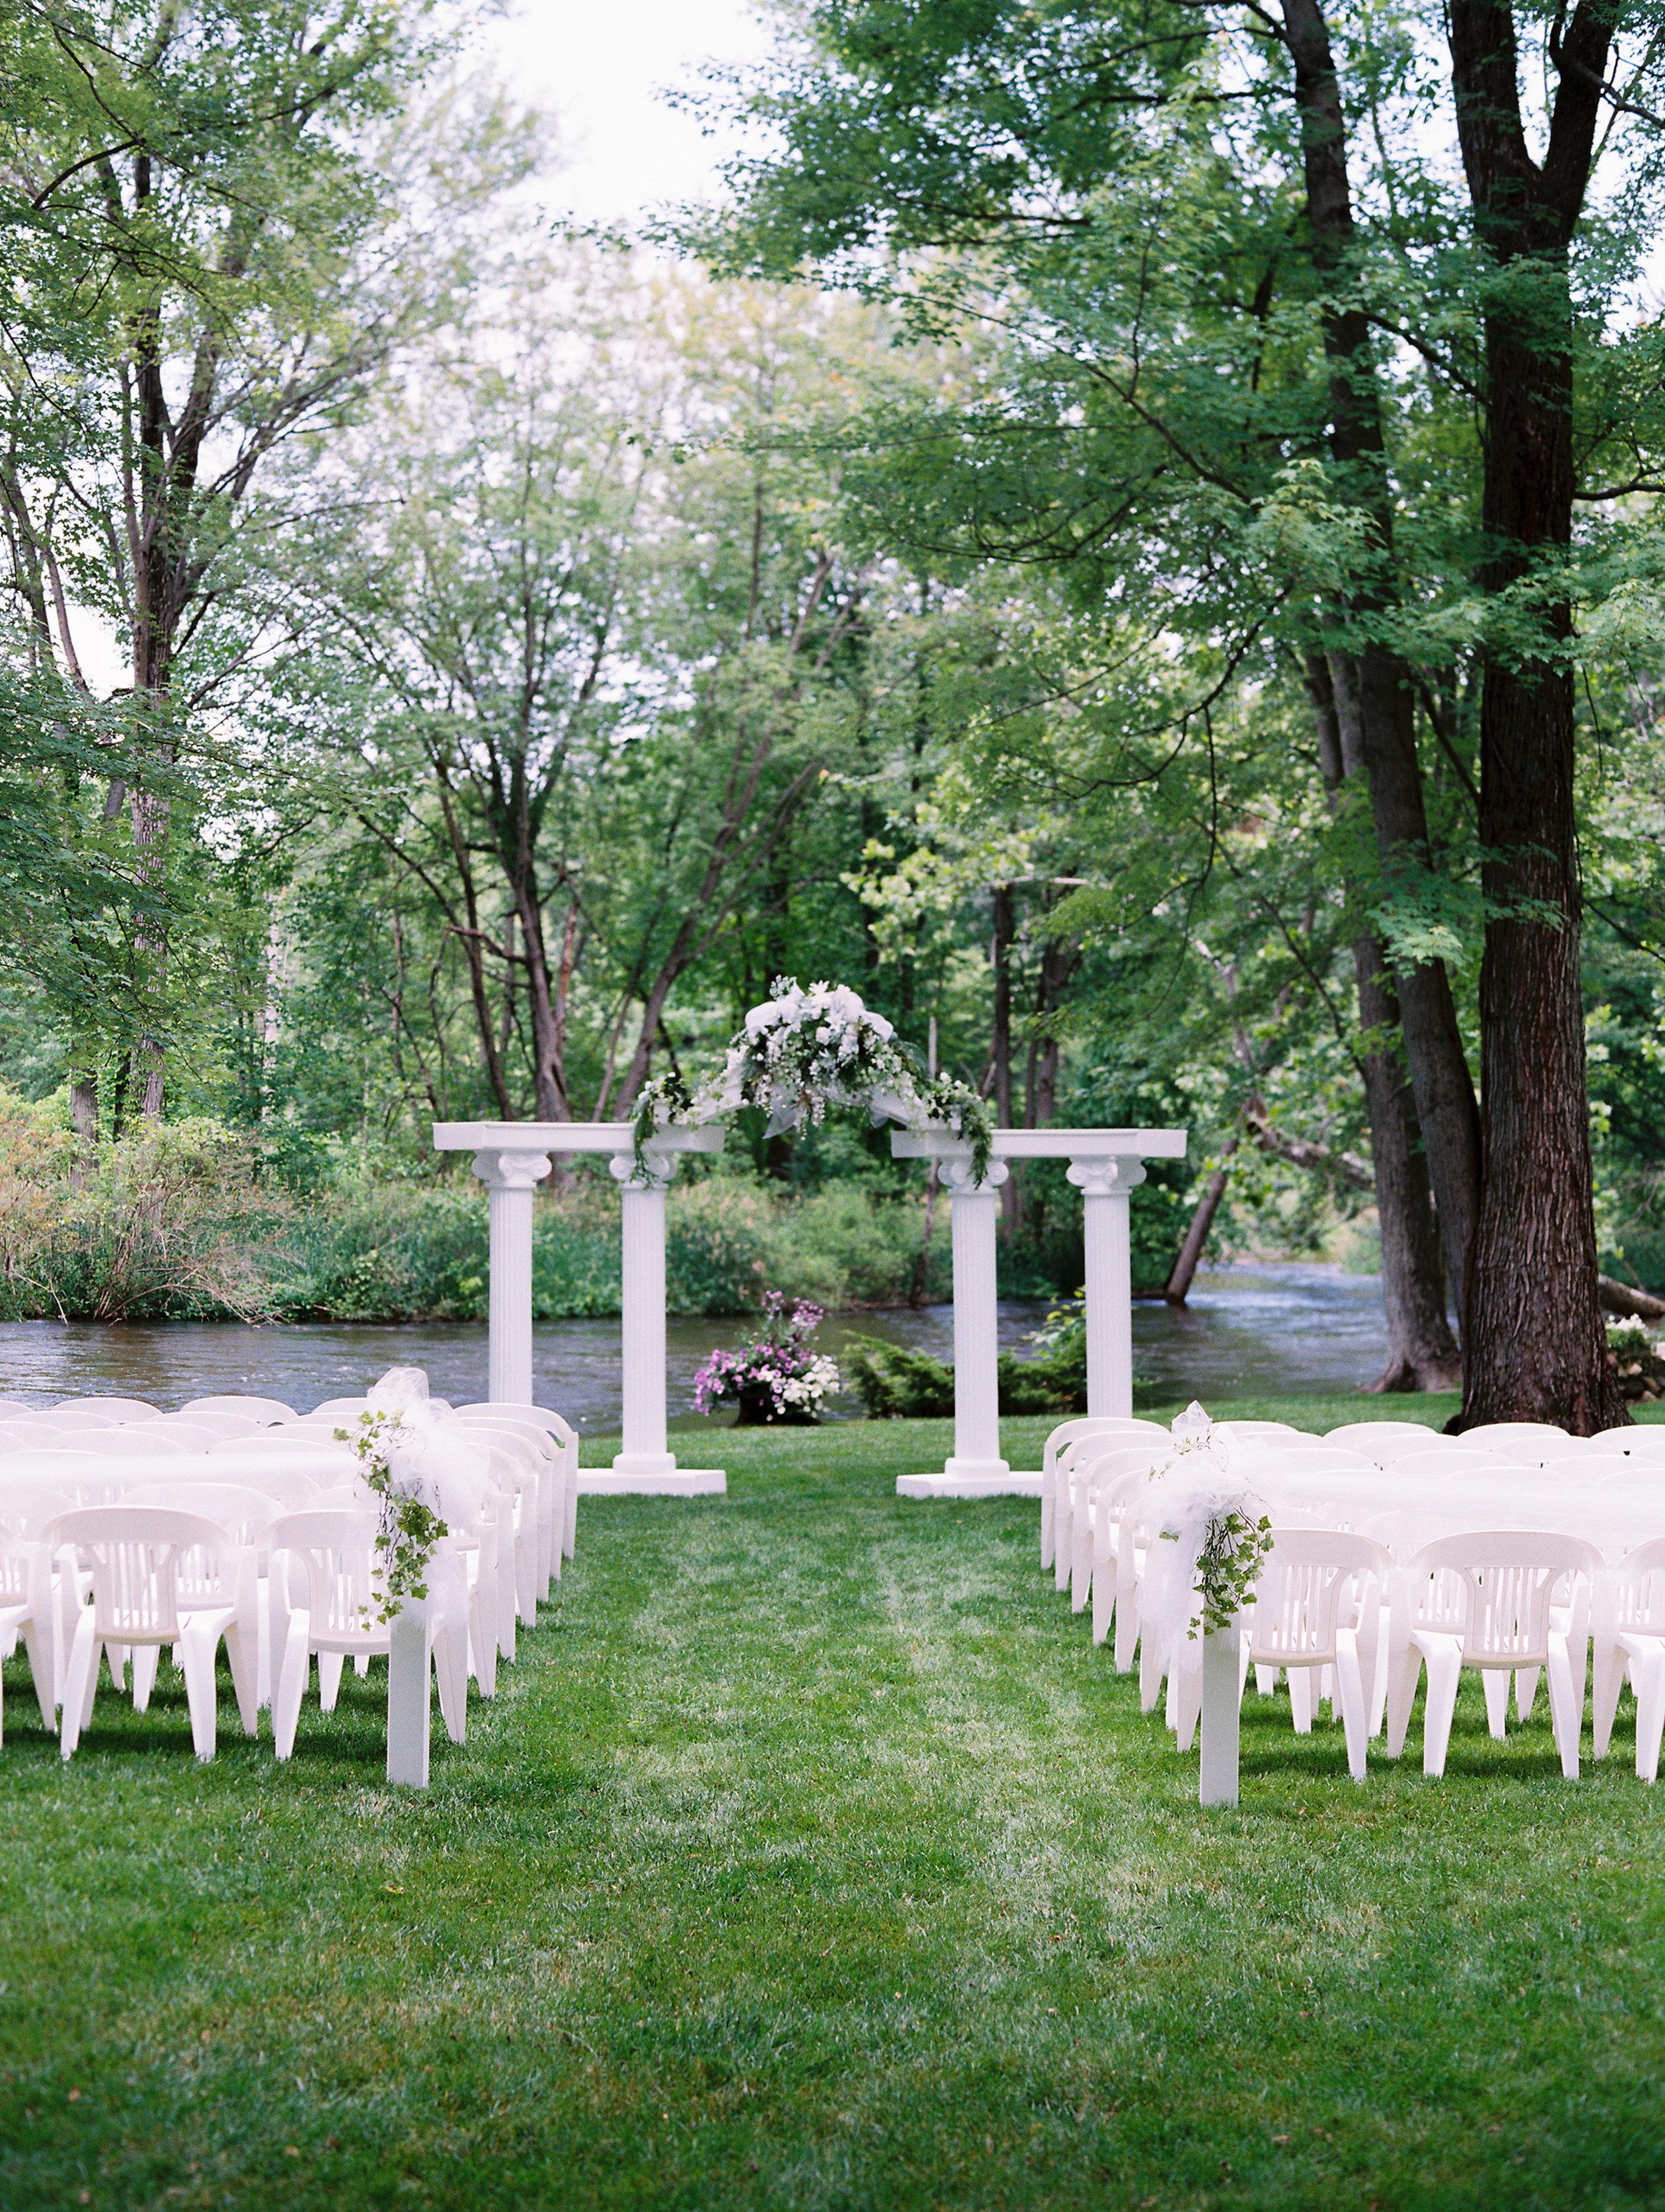 Conger+Wedding+Ceremony+Details-20.jpg